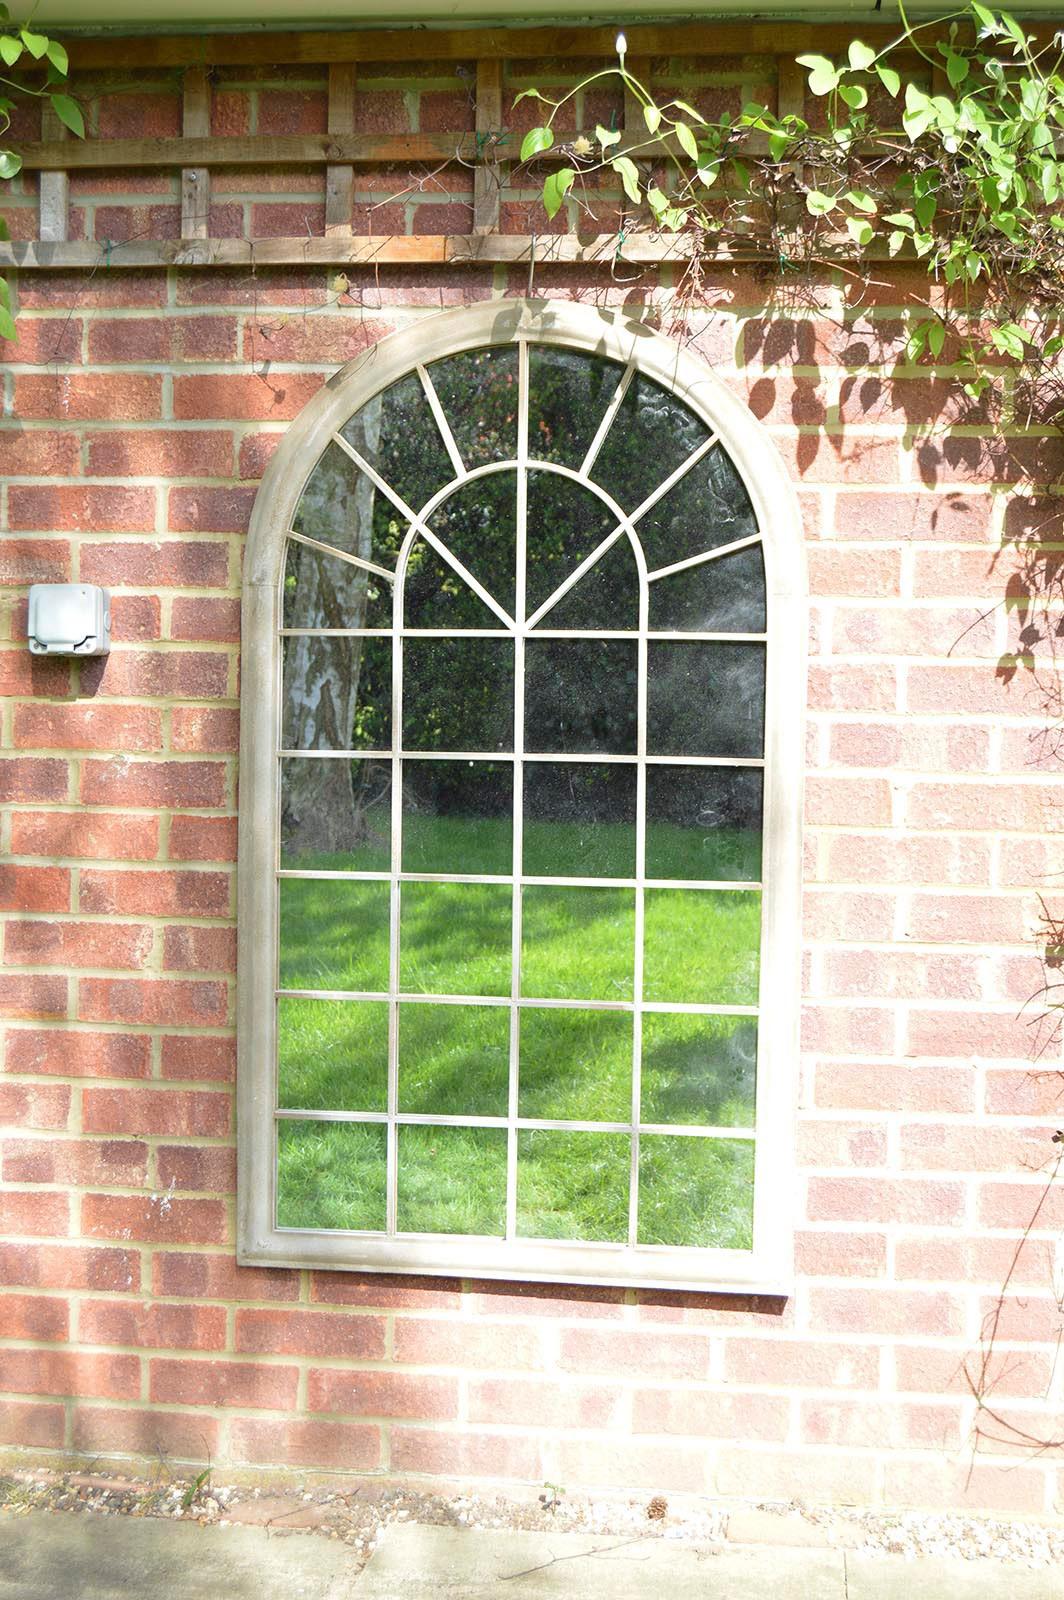 Outdoor Arch Top Stone Effect Garden Mirror 4ft3 X 2ft6